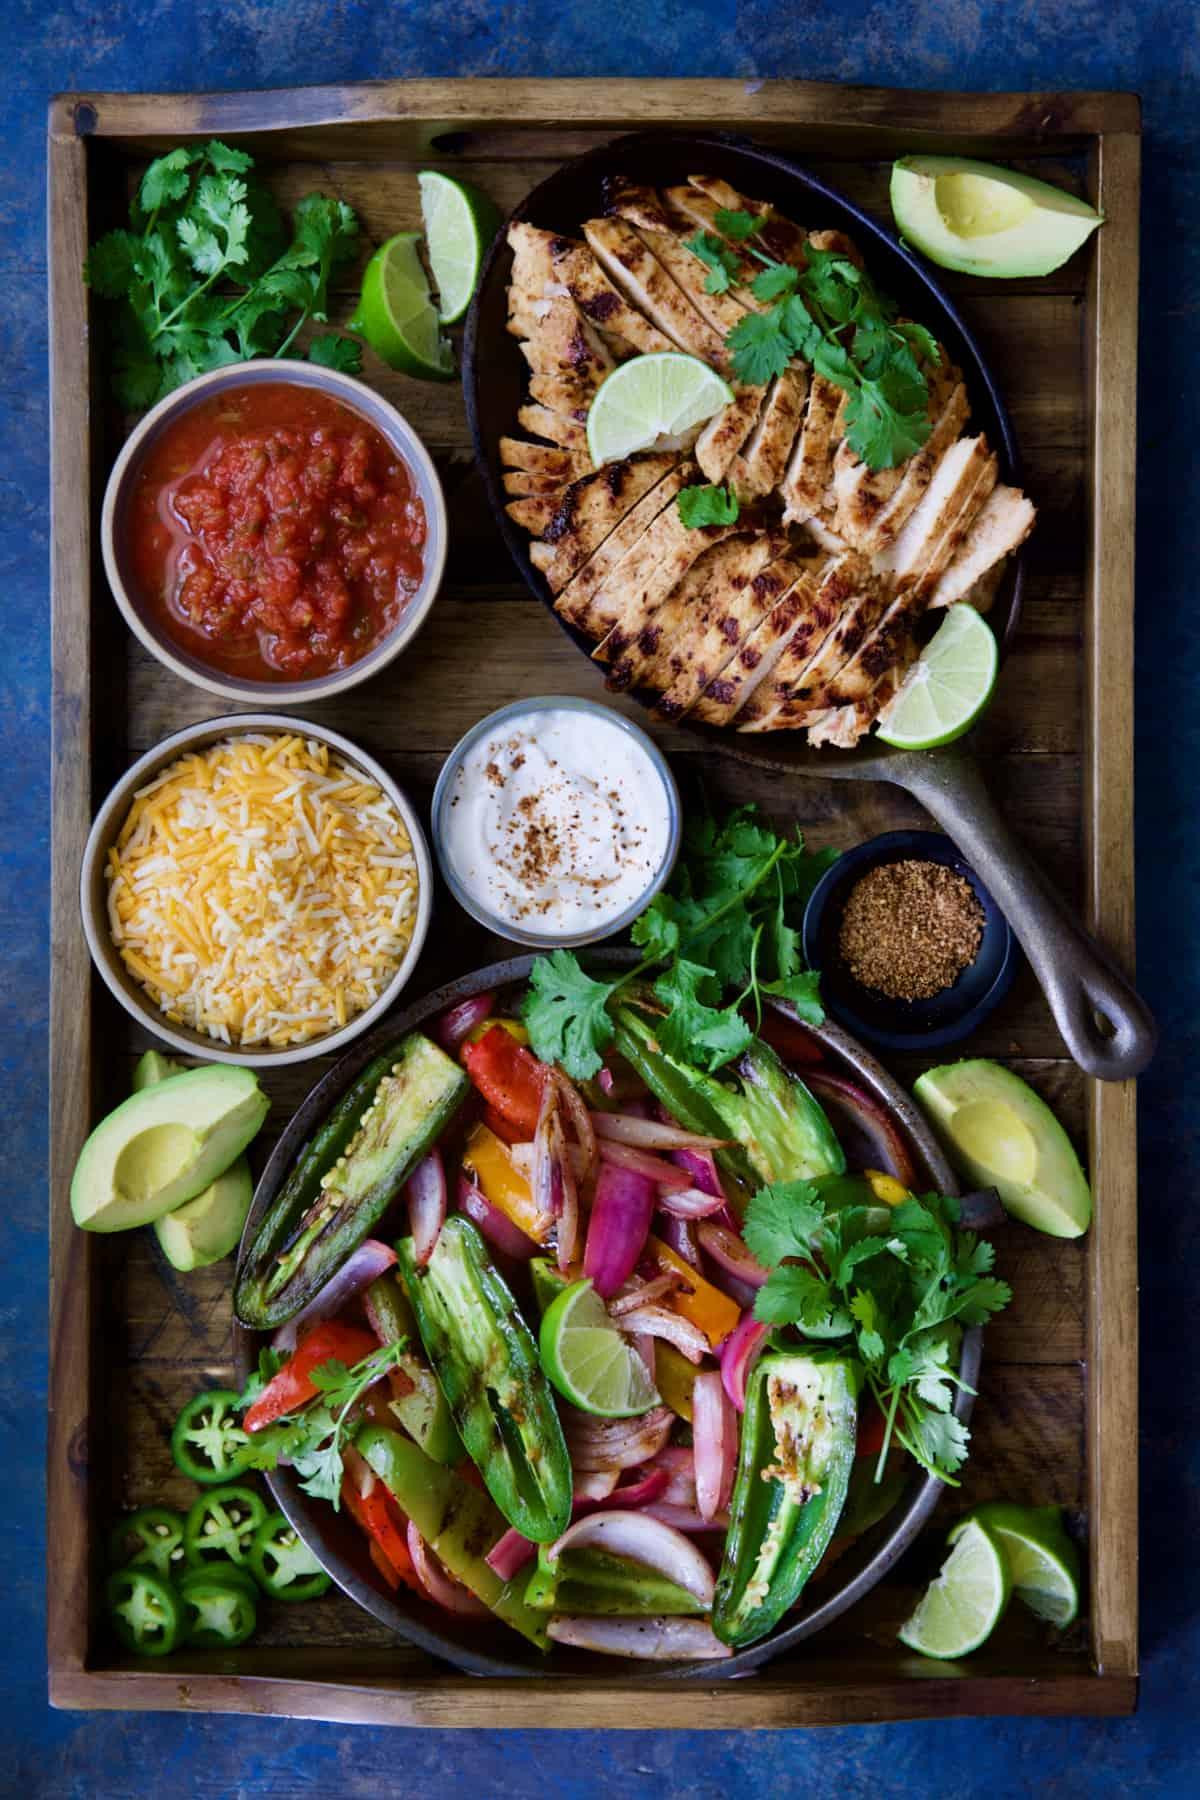 Grilled Tajin-Seasoned Chicken Fajitas on wood tray with accompaniments:  Salsa, sour cream, cheese, etc.